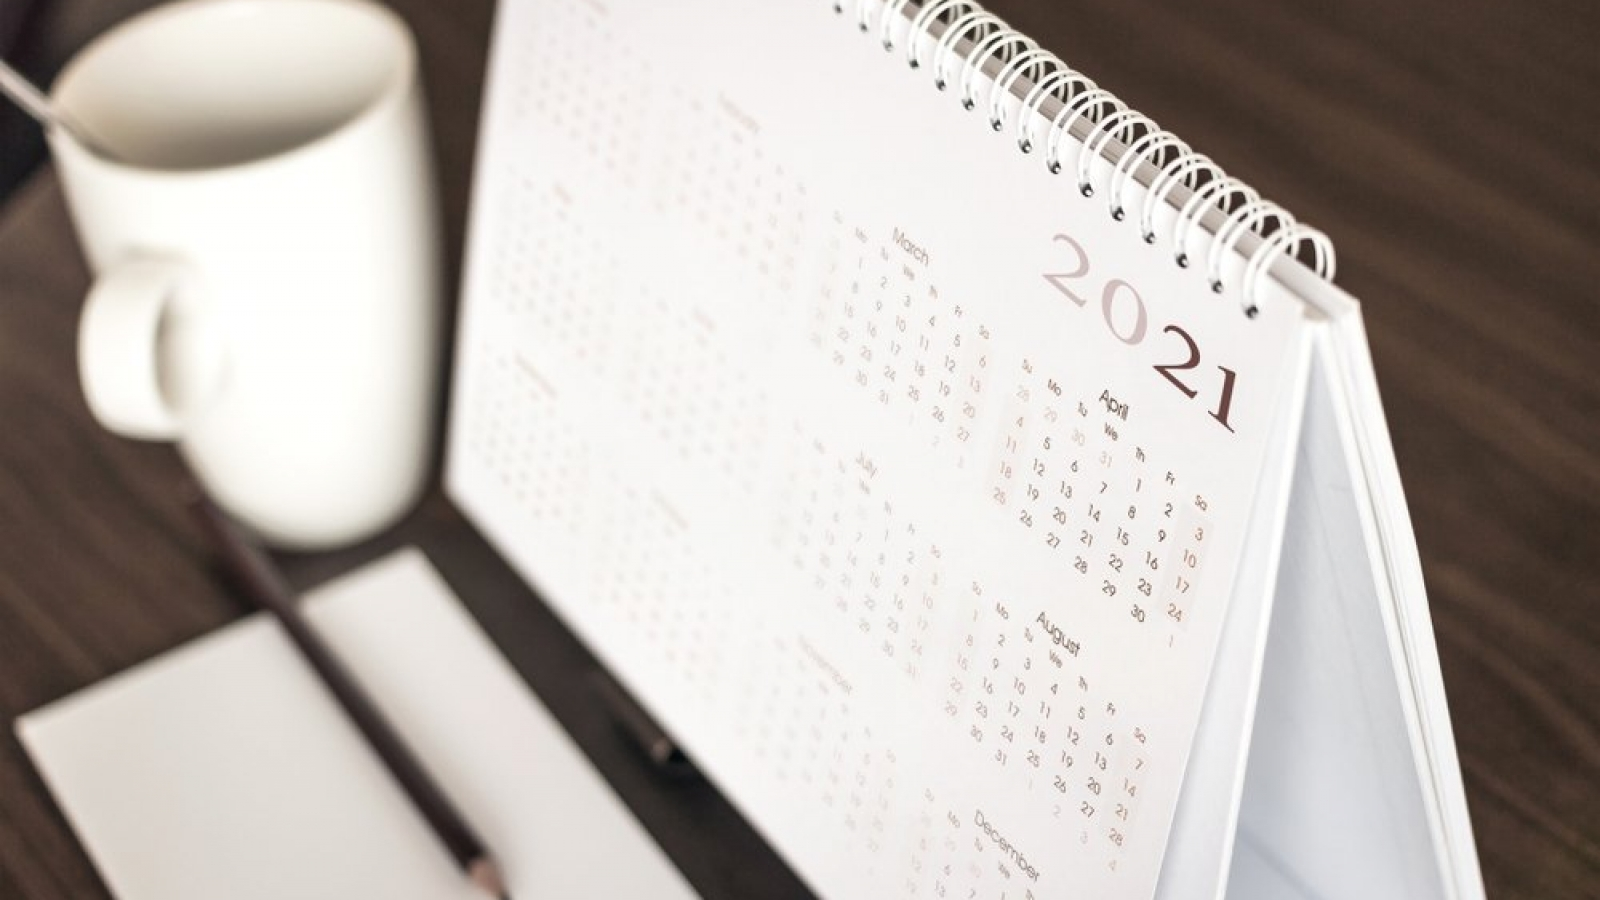 2021 course dates